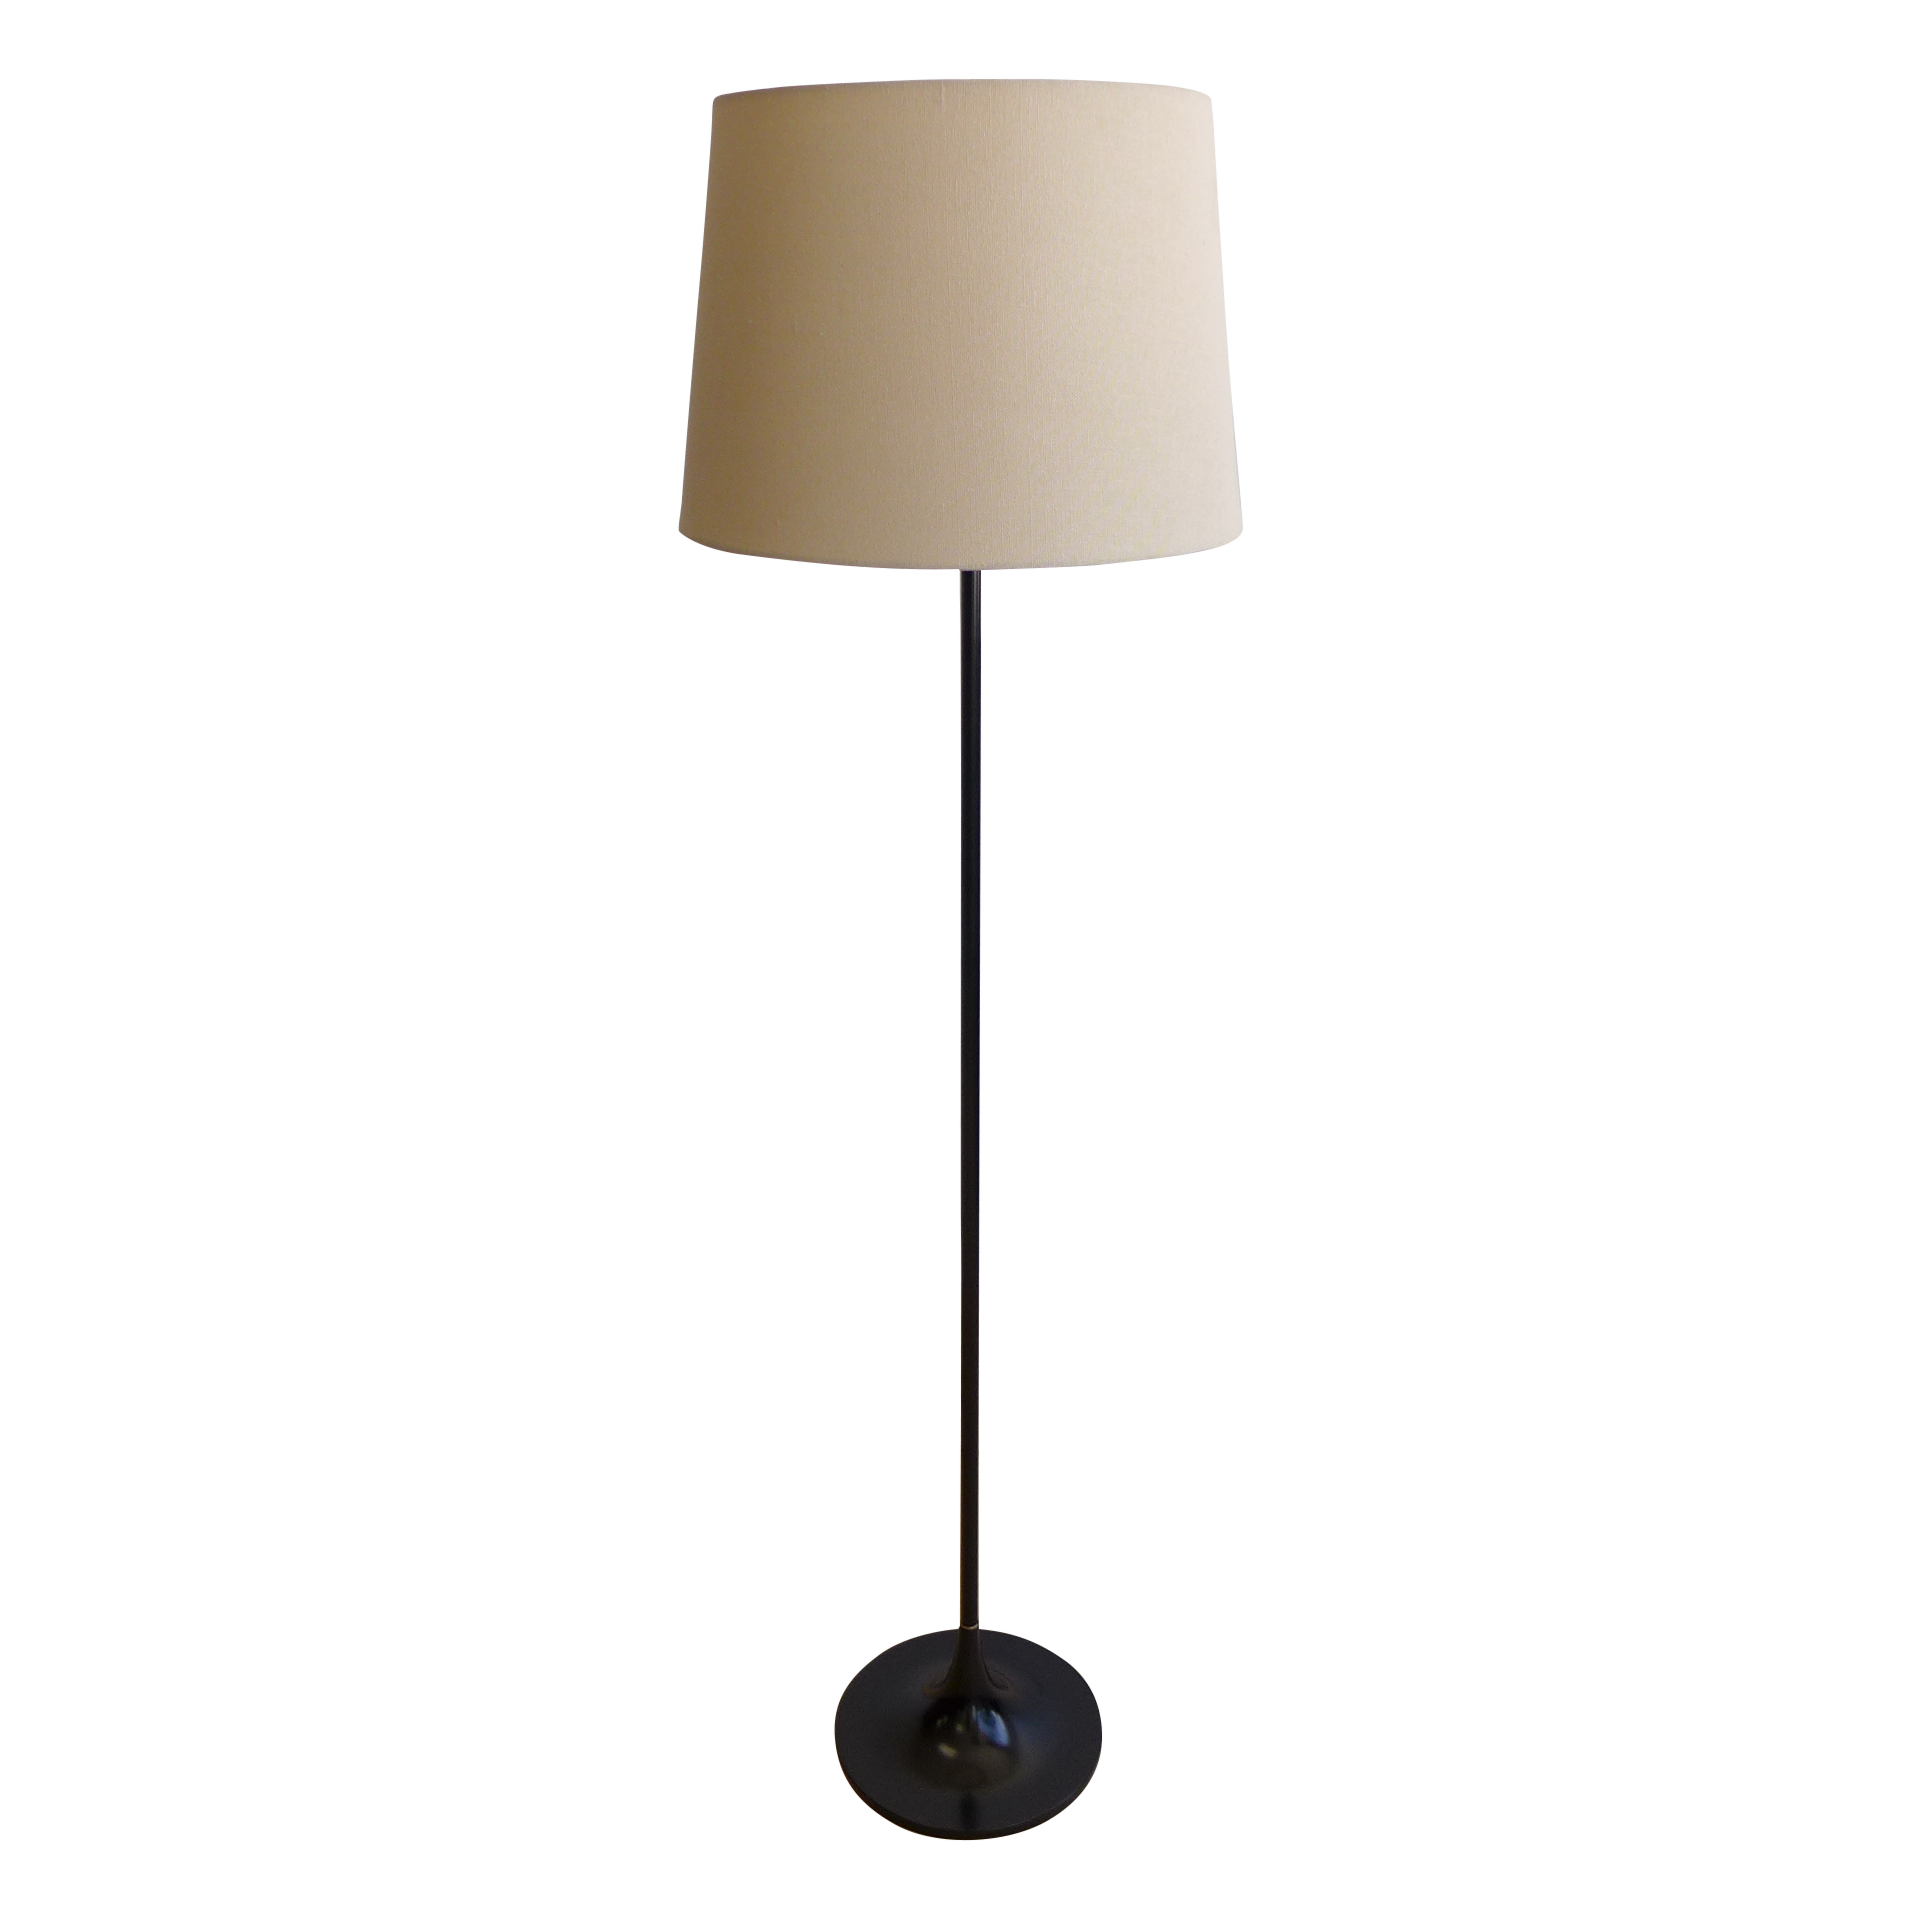 Laurel lighting eames era tulip floor lamp chairish for Eames lampe